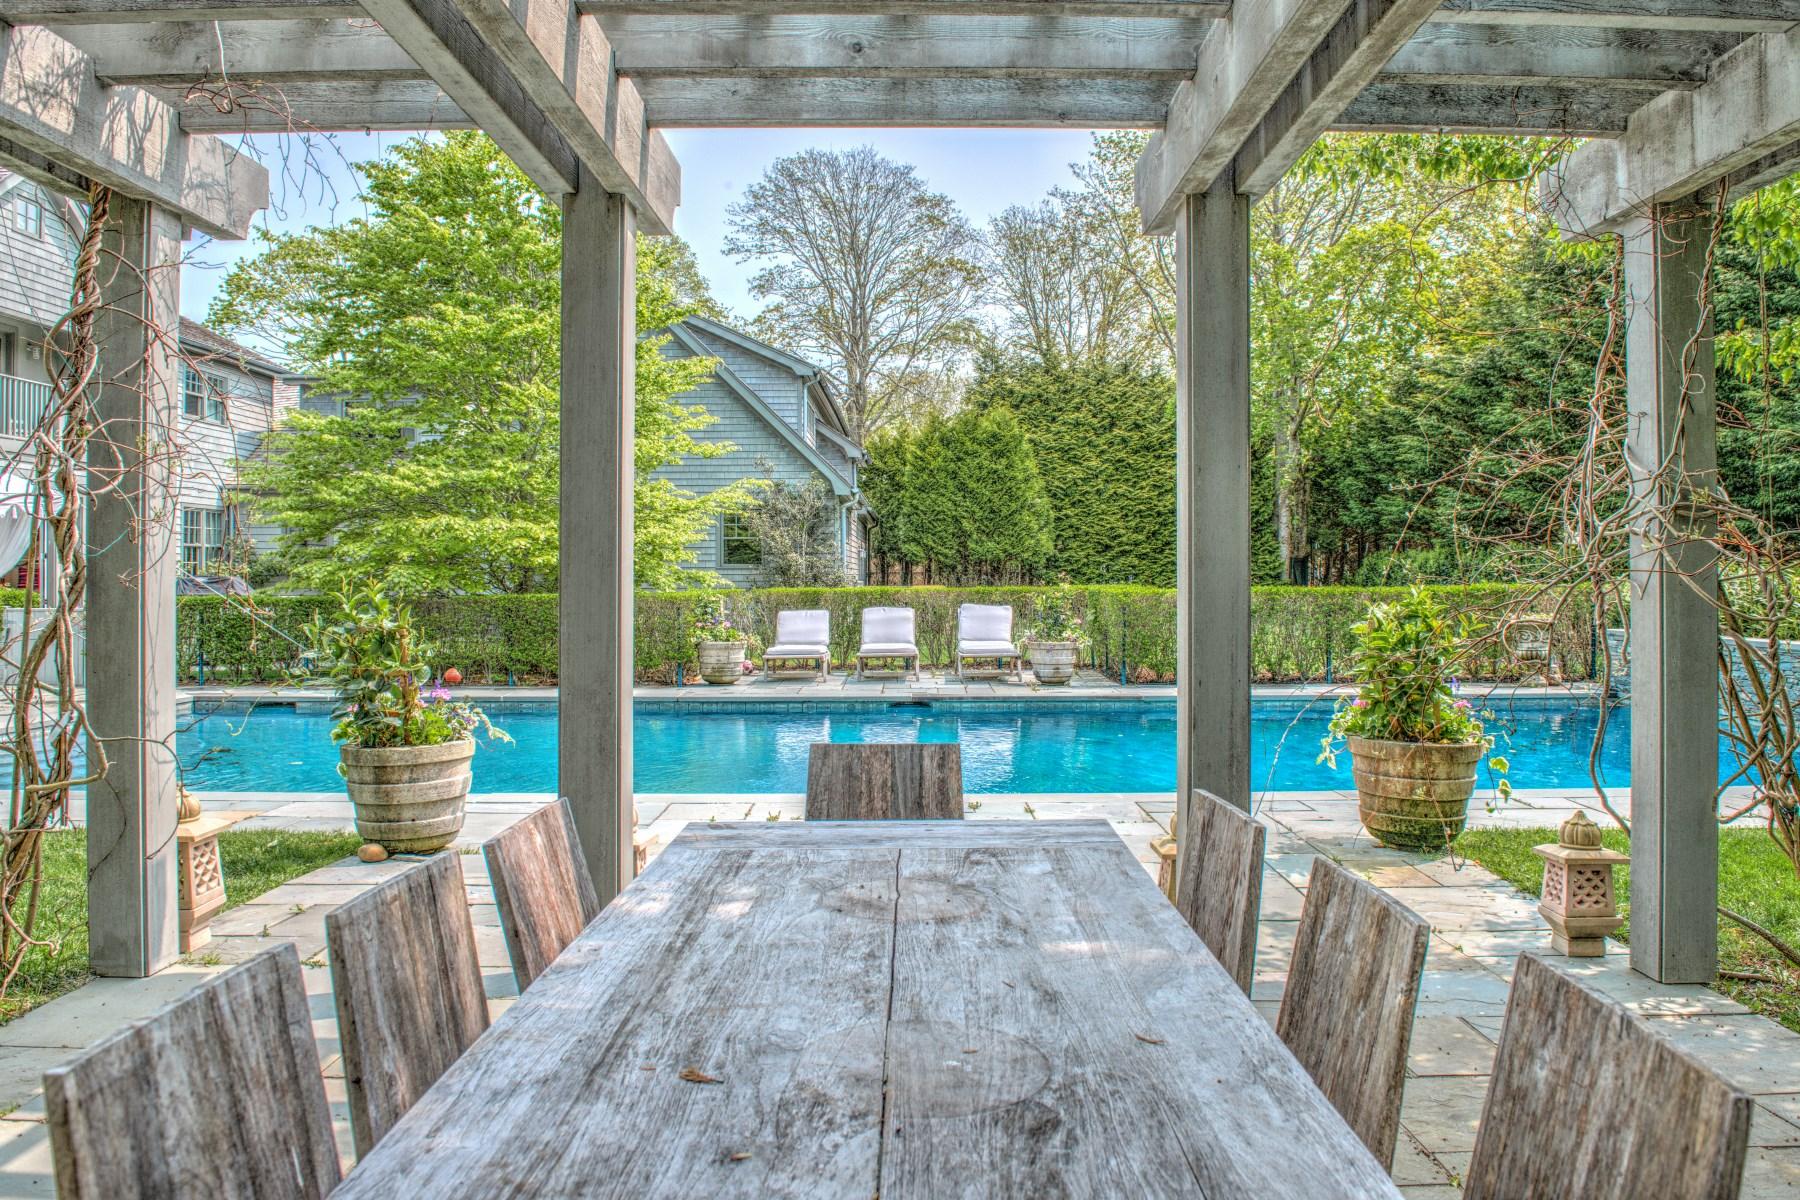 Additional photo for property listing at Amagansett Lanes 36 Hedges Ln Amagansett, New York 11930 United States